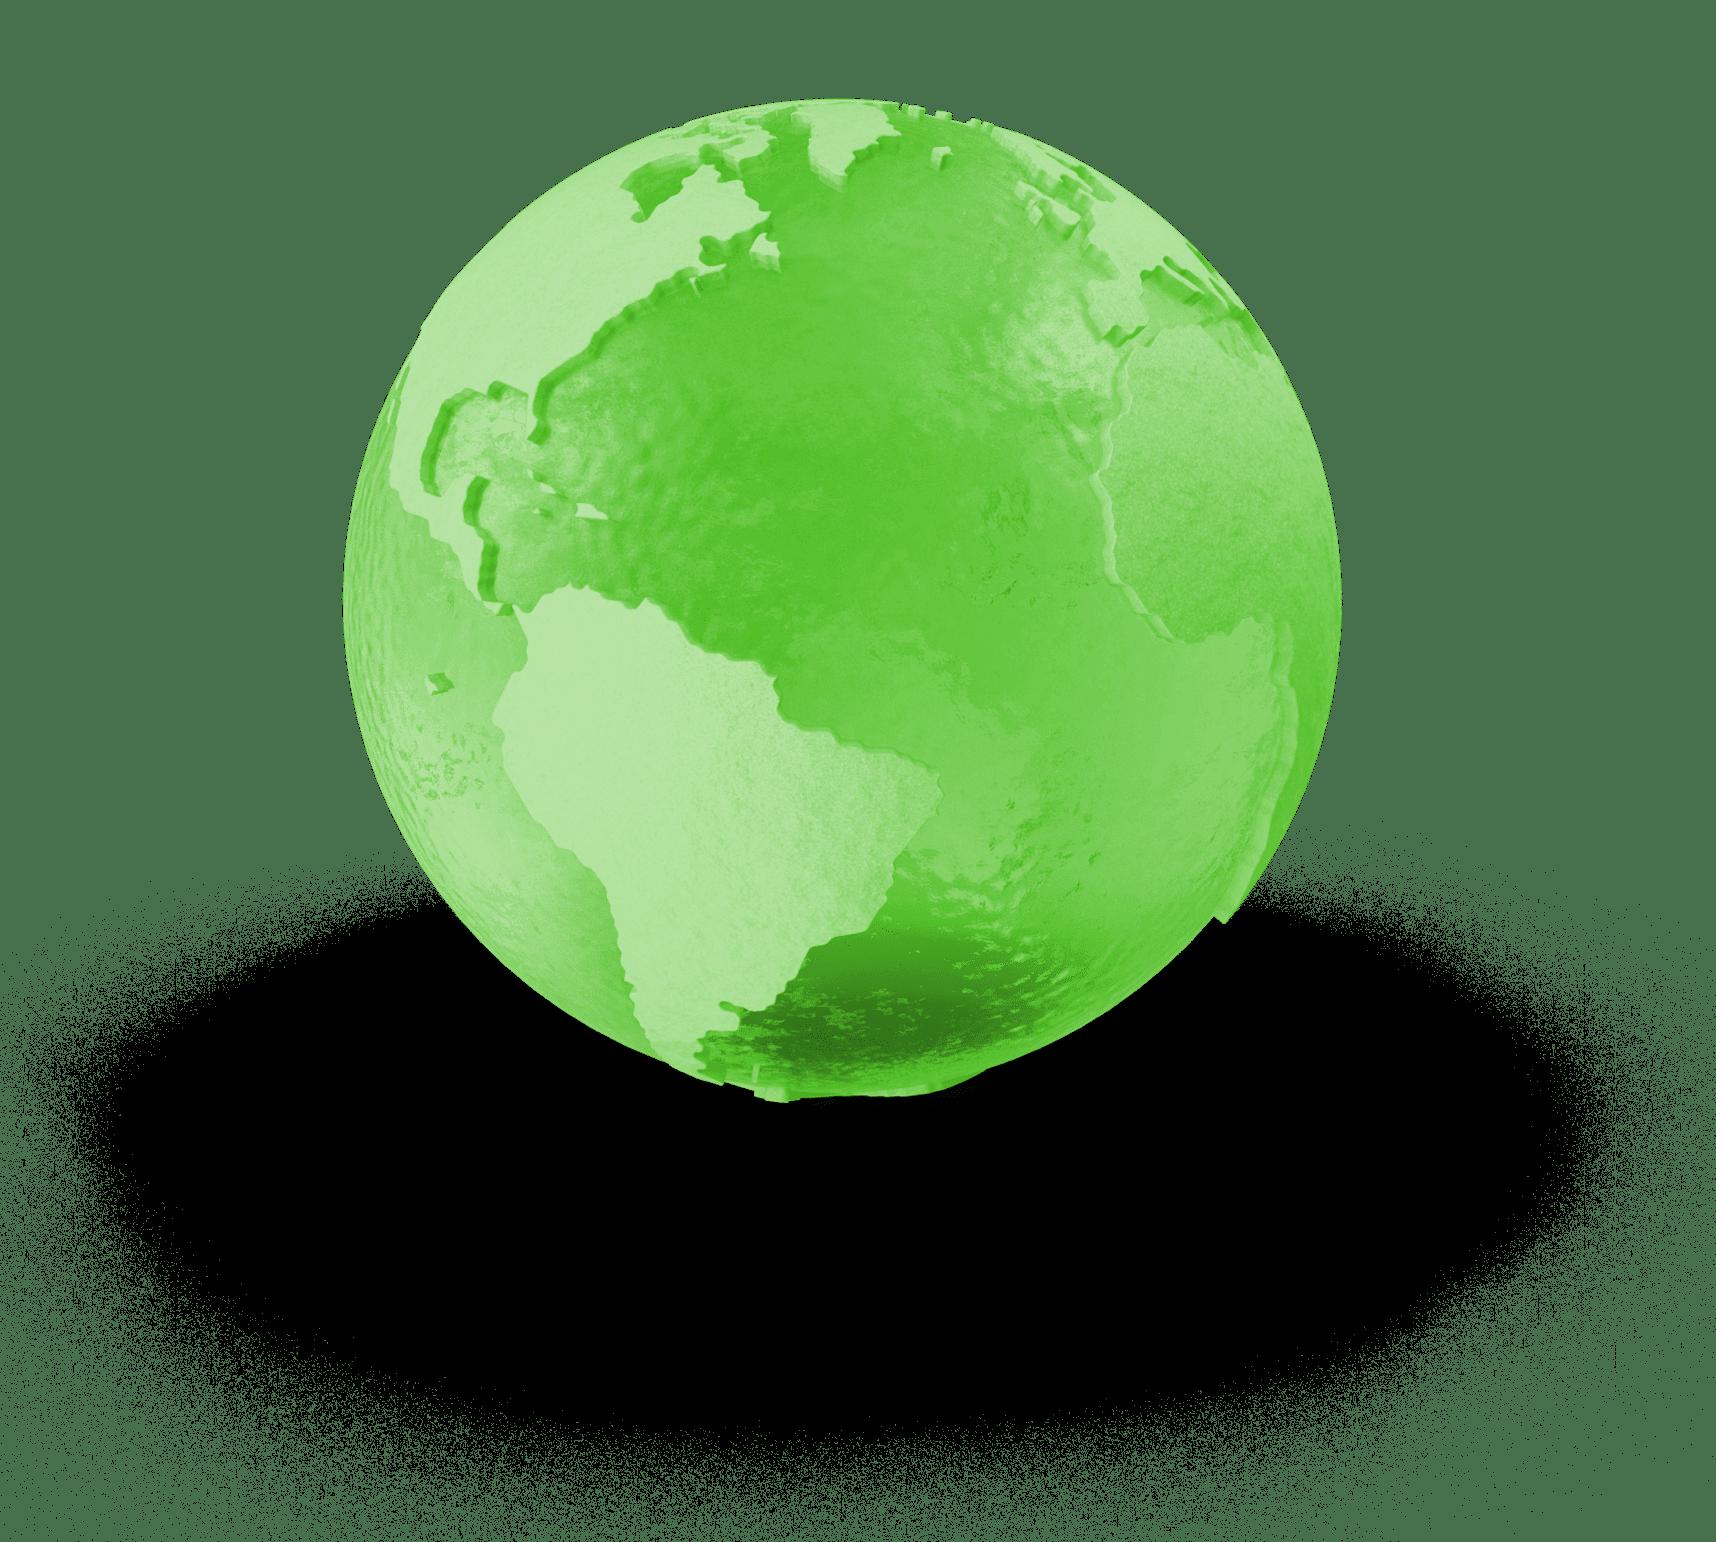 Grafika zelené zeměkoule